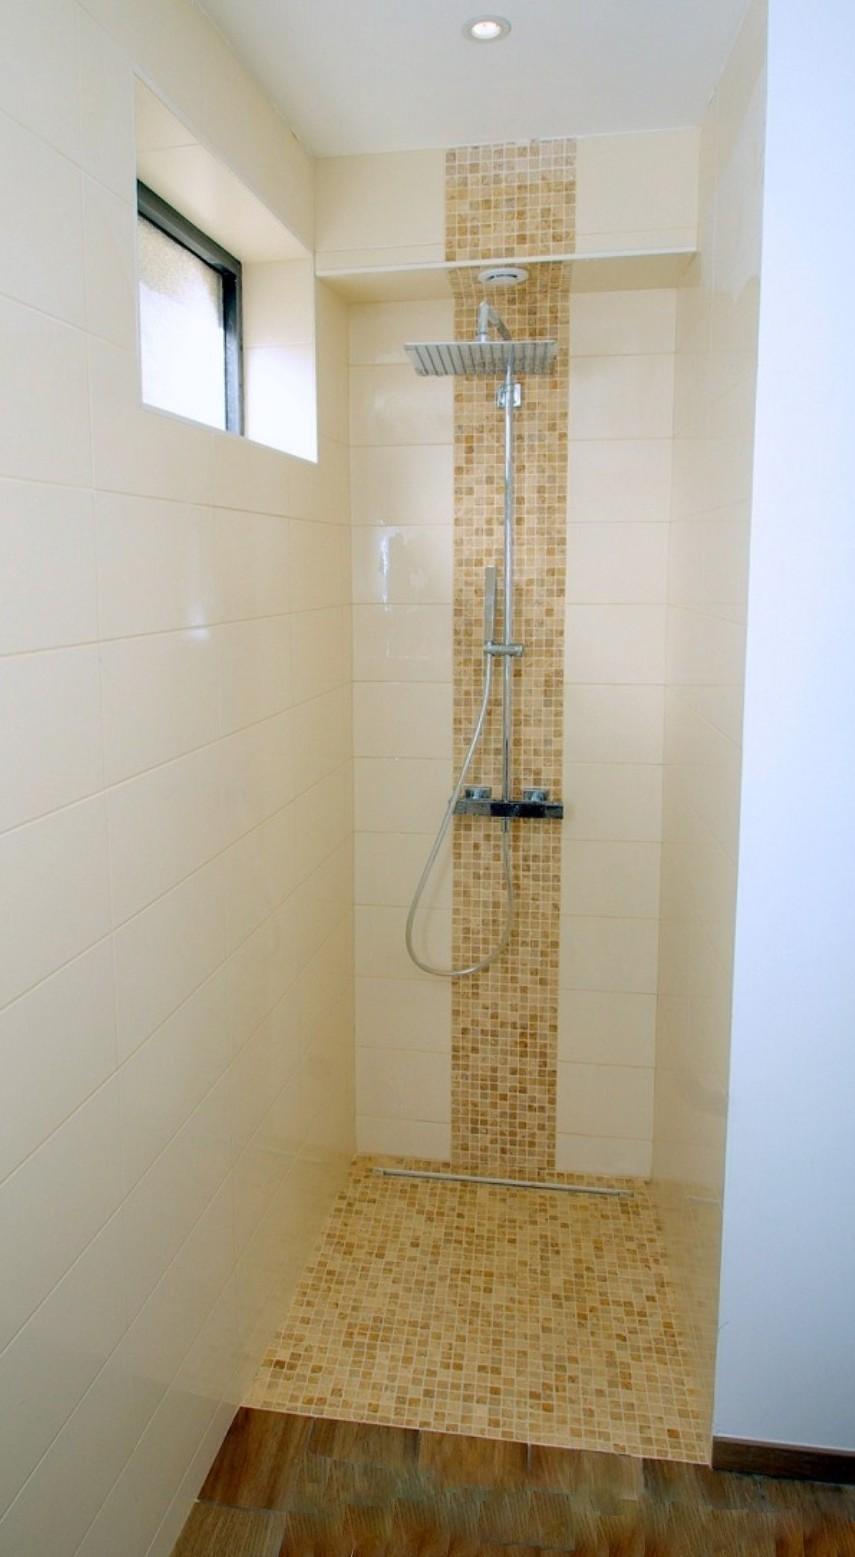 Carrelage et fa ence for Listel carrelage salle de bain